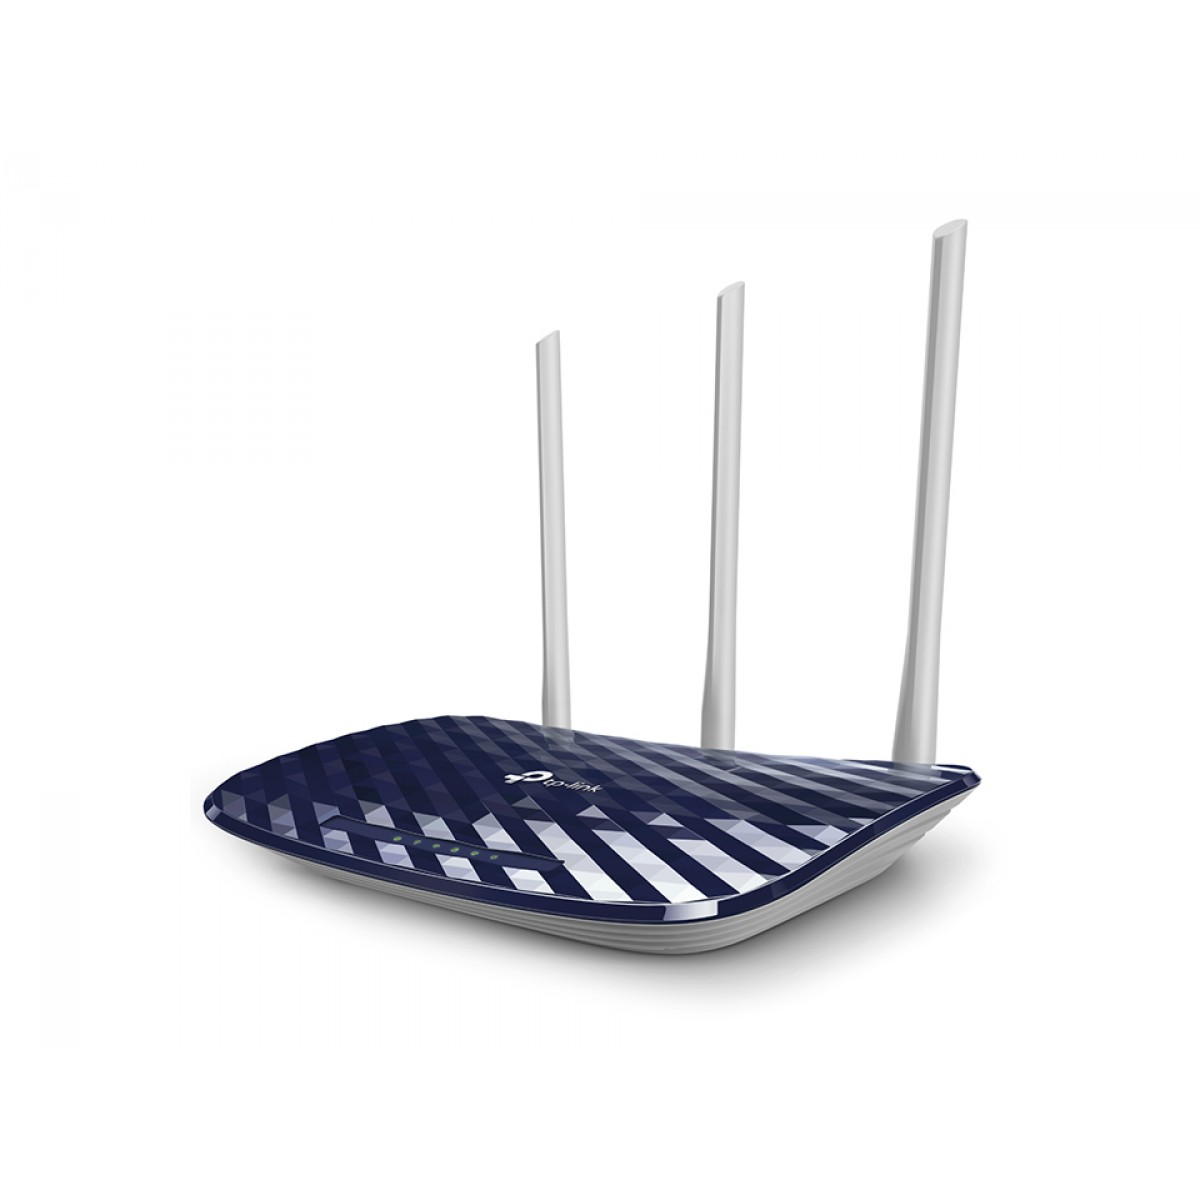 Roteador Wireless TPLINK Archer C20 Dual-band Wireless AC750 5GHz 433Mbps 802.11ac